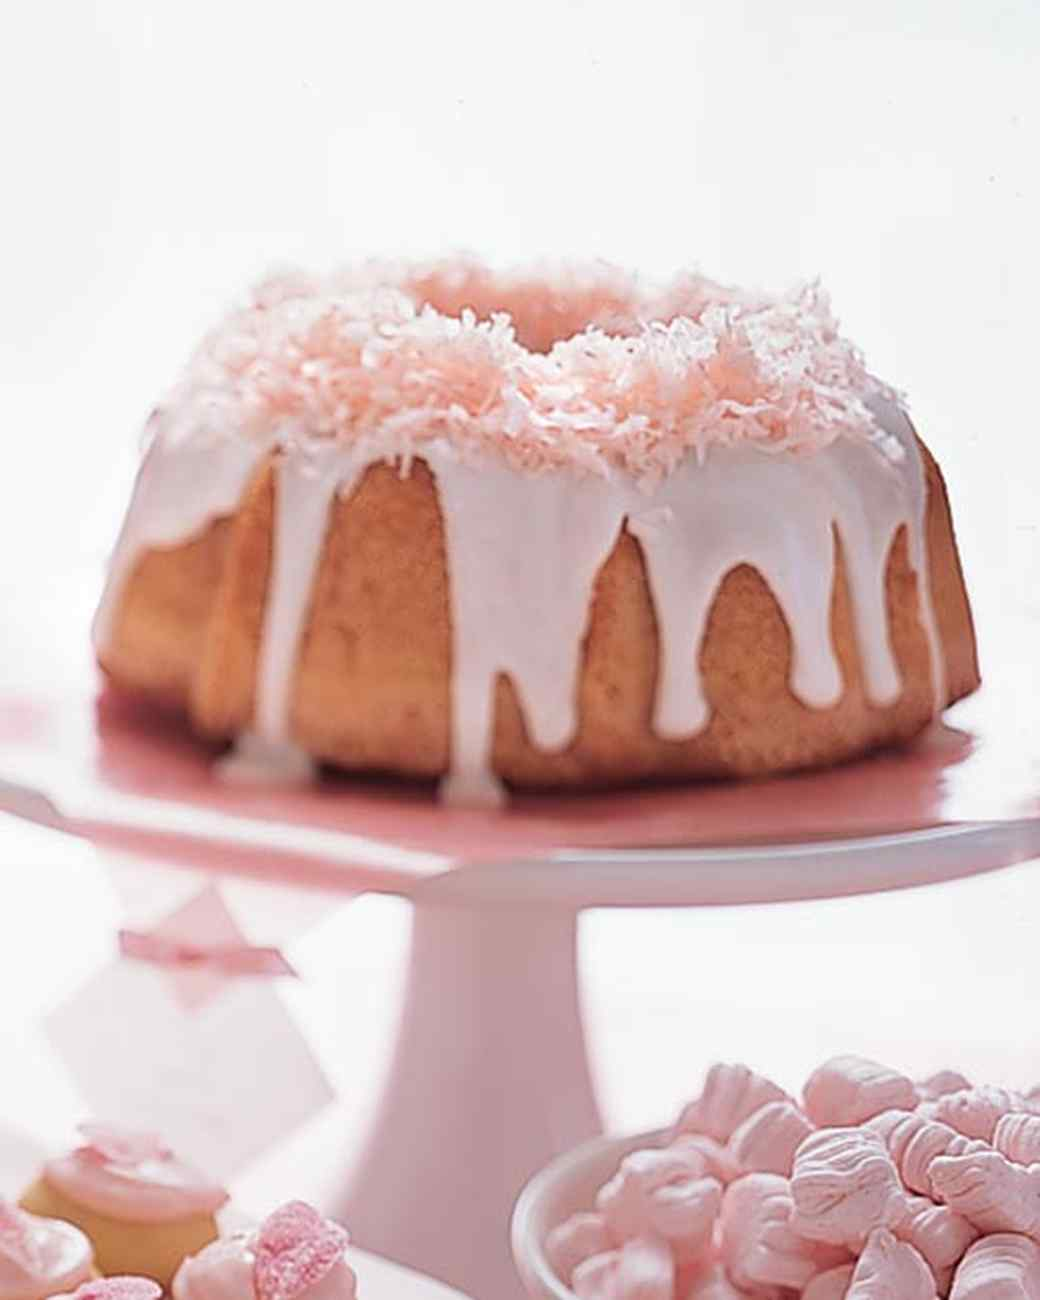 mw810d2_spring03_pink_coconut_cake.jpg